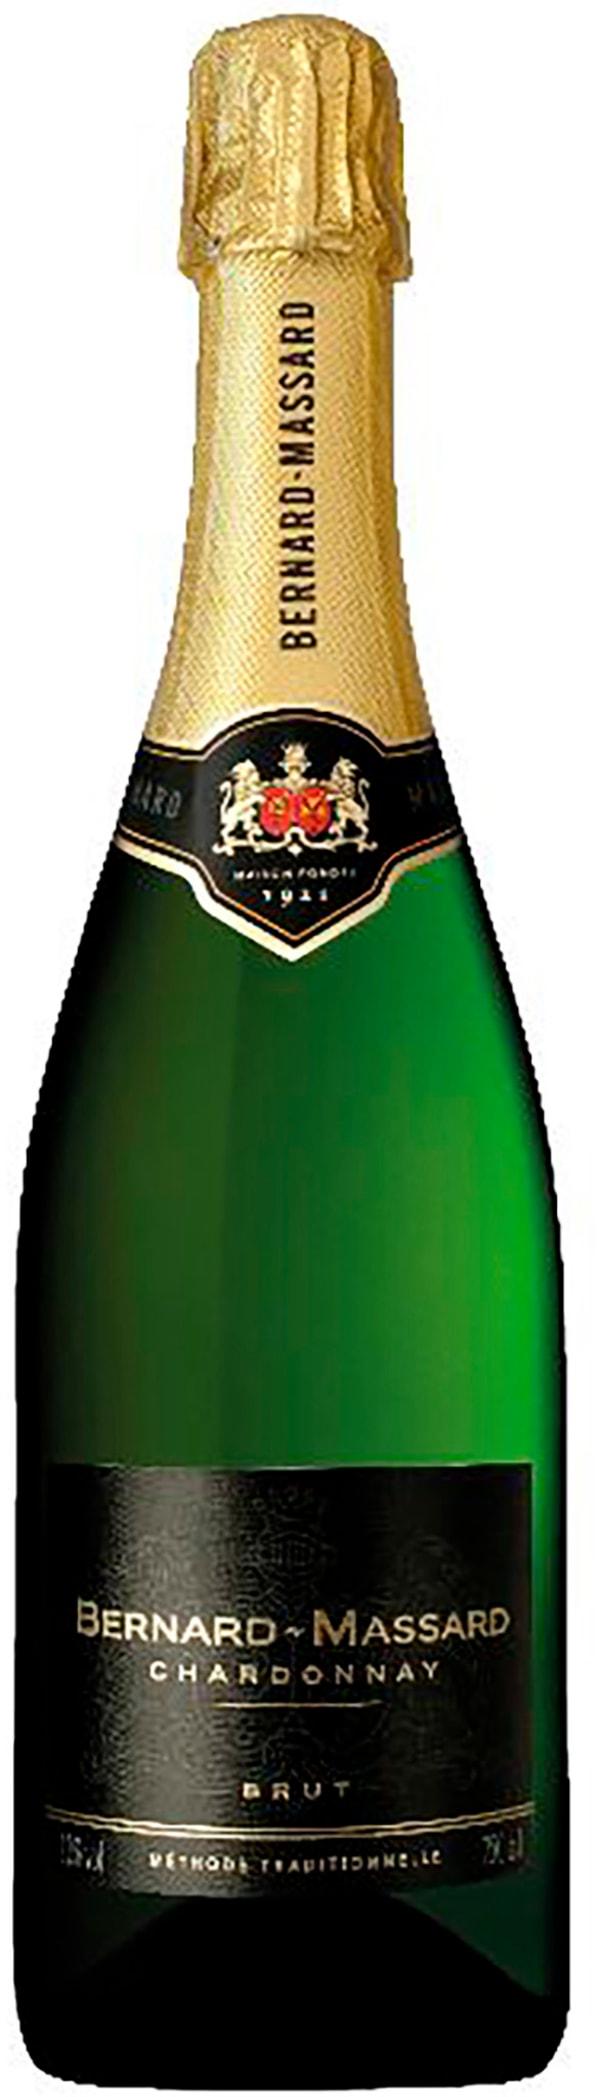 Bernard-Massard Chardonnay Brut